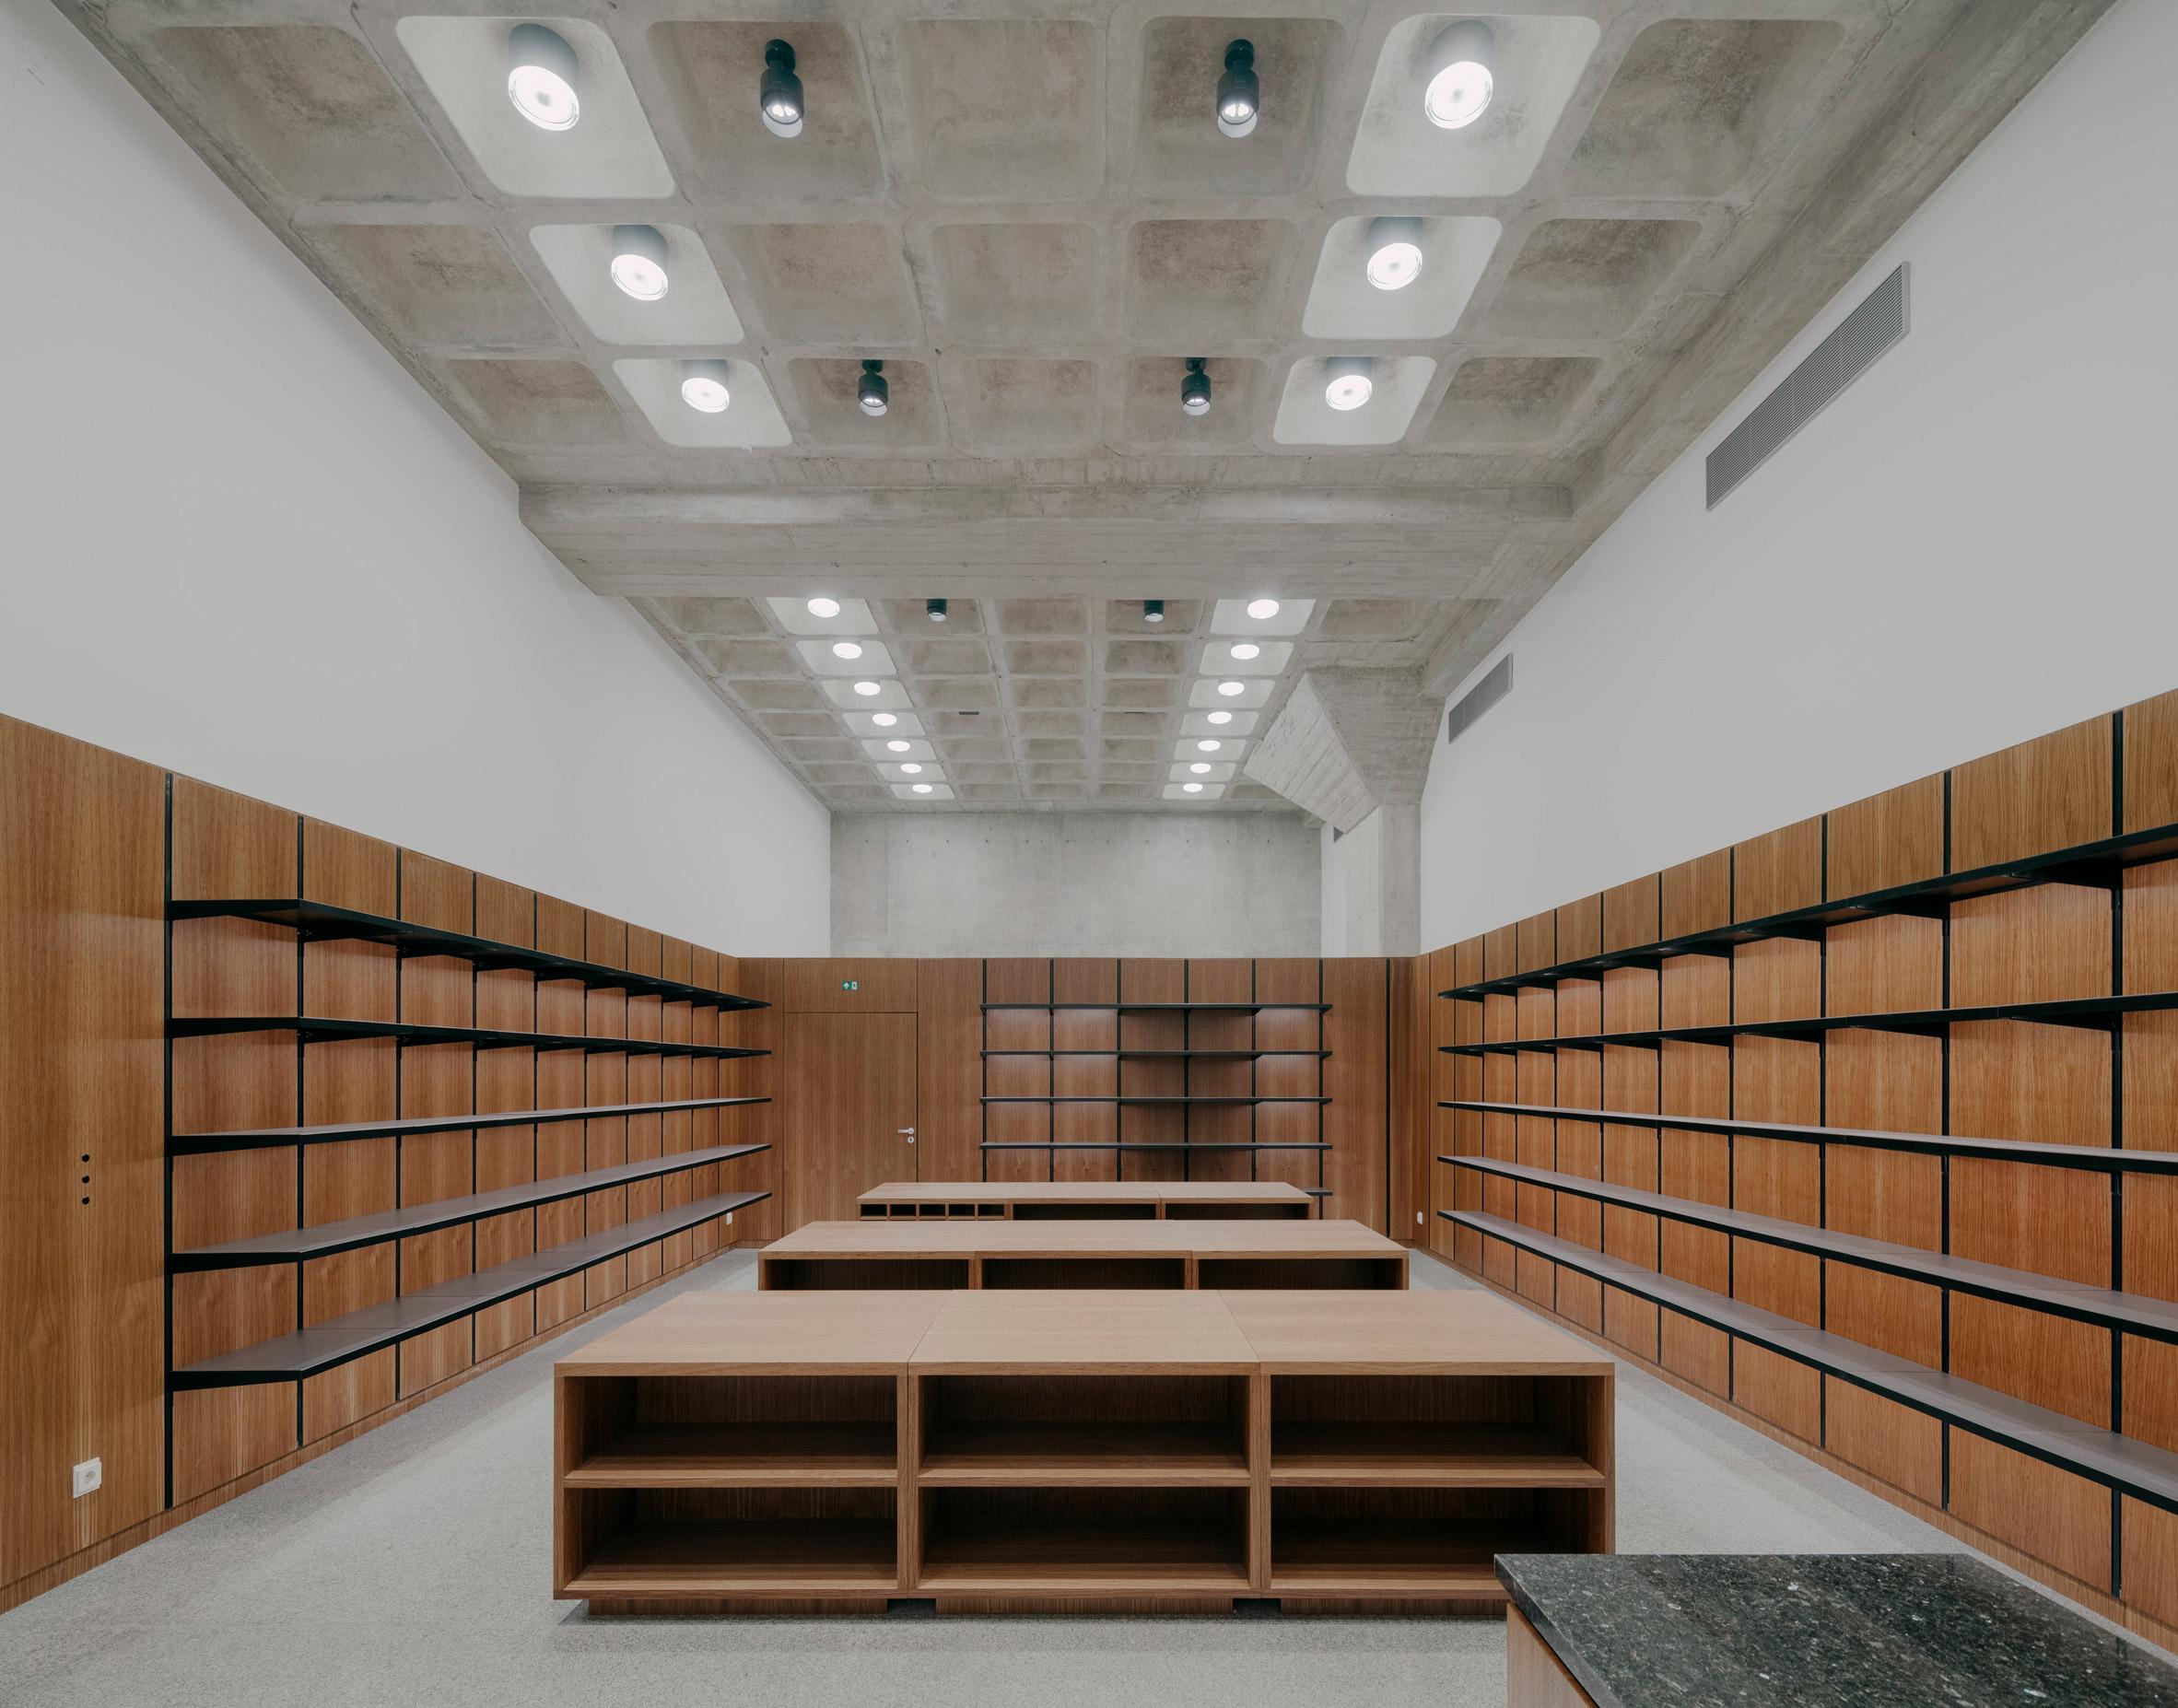 A storage room inside Neue Nationalgalerie